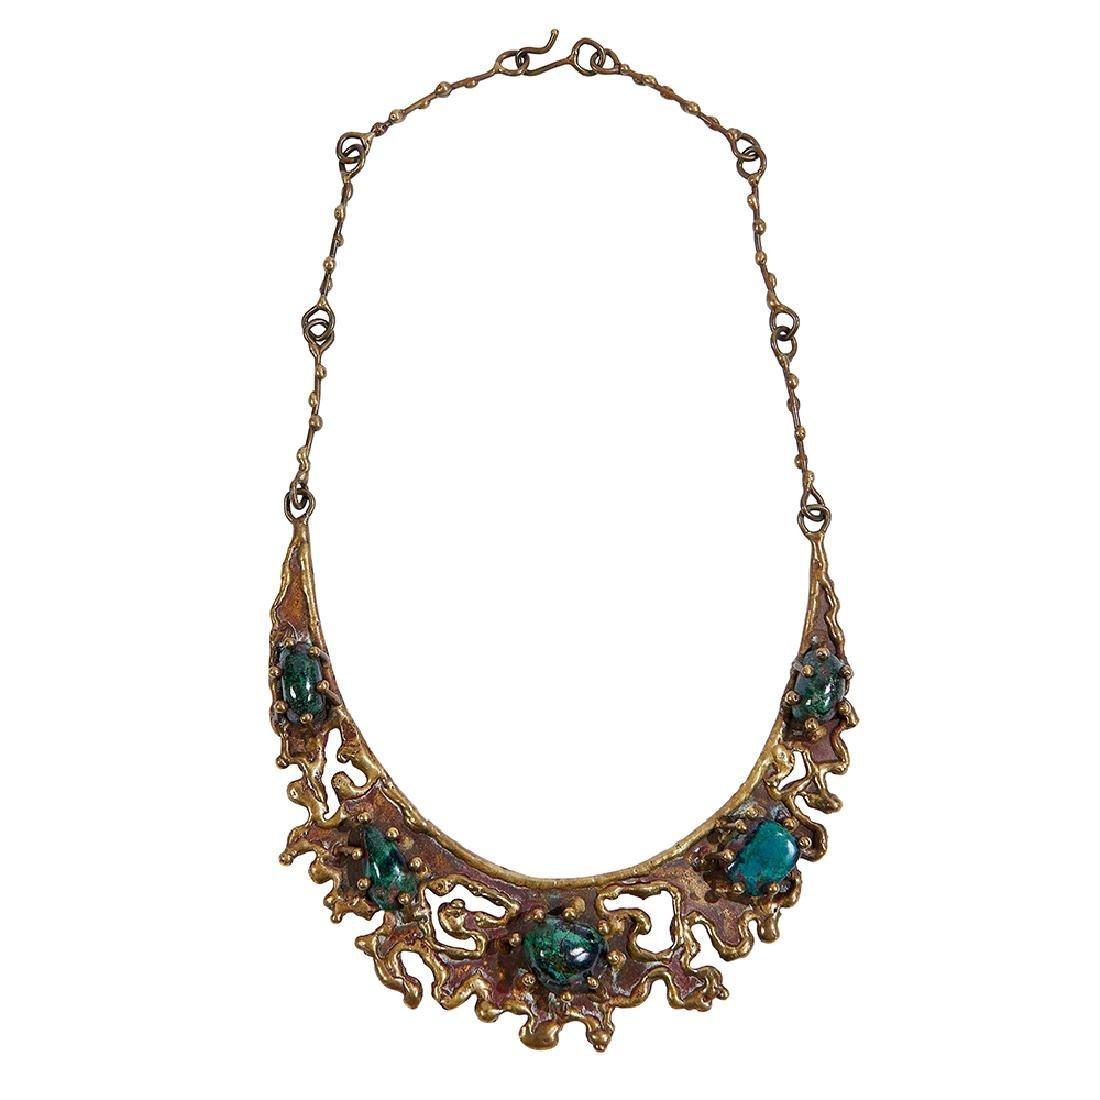 Pal Kepenyes collar necklace